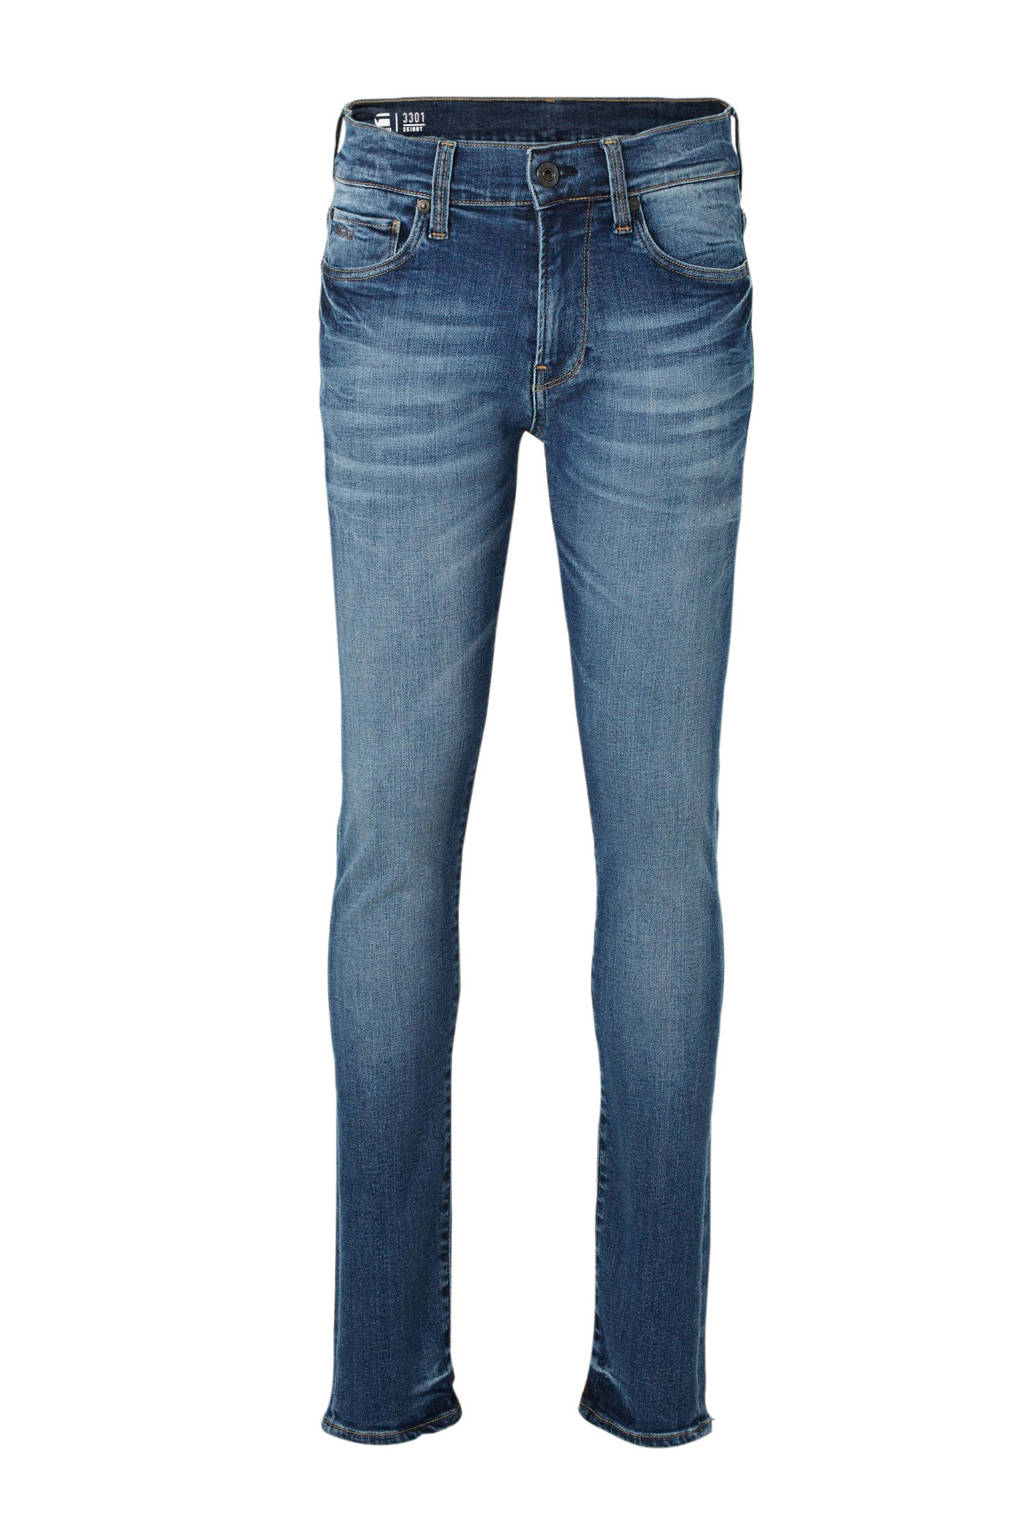 G-Star RAW 3301 slim fit jeans dark indigo lame, Dark indigo lame